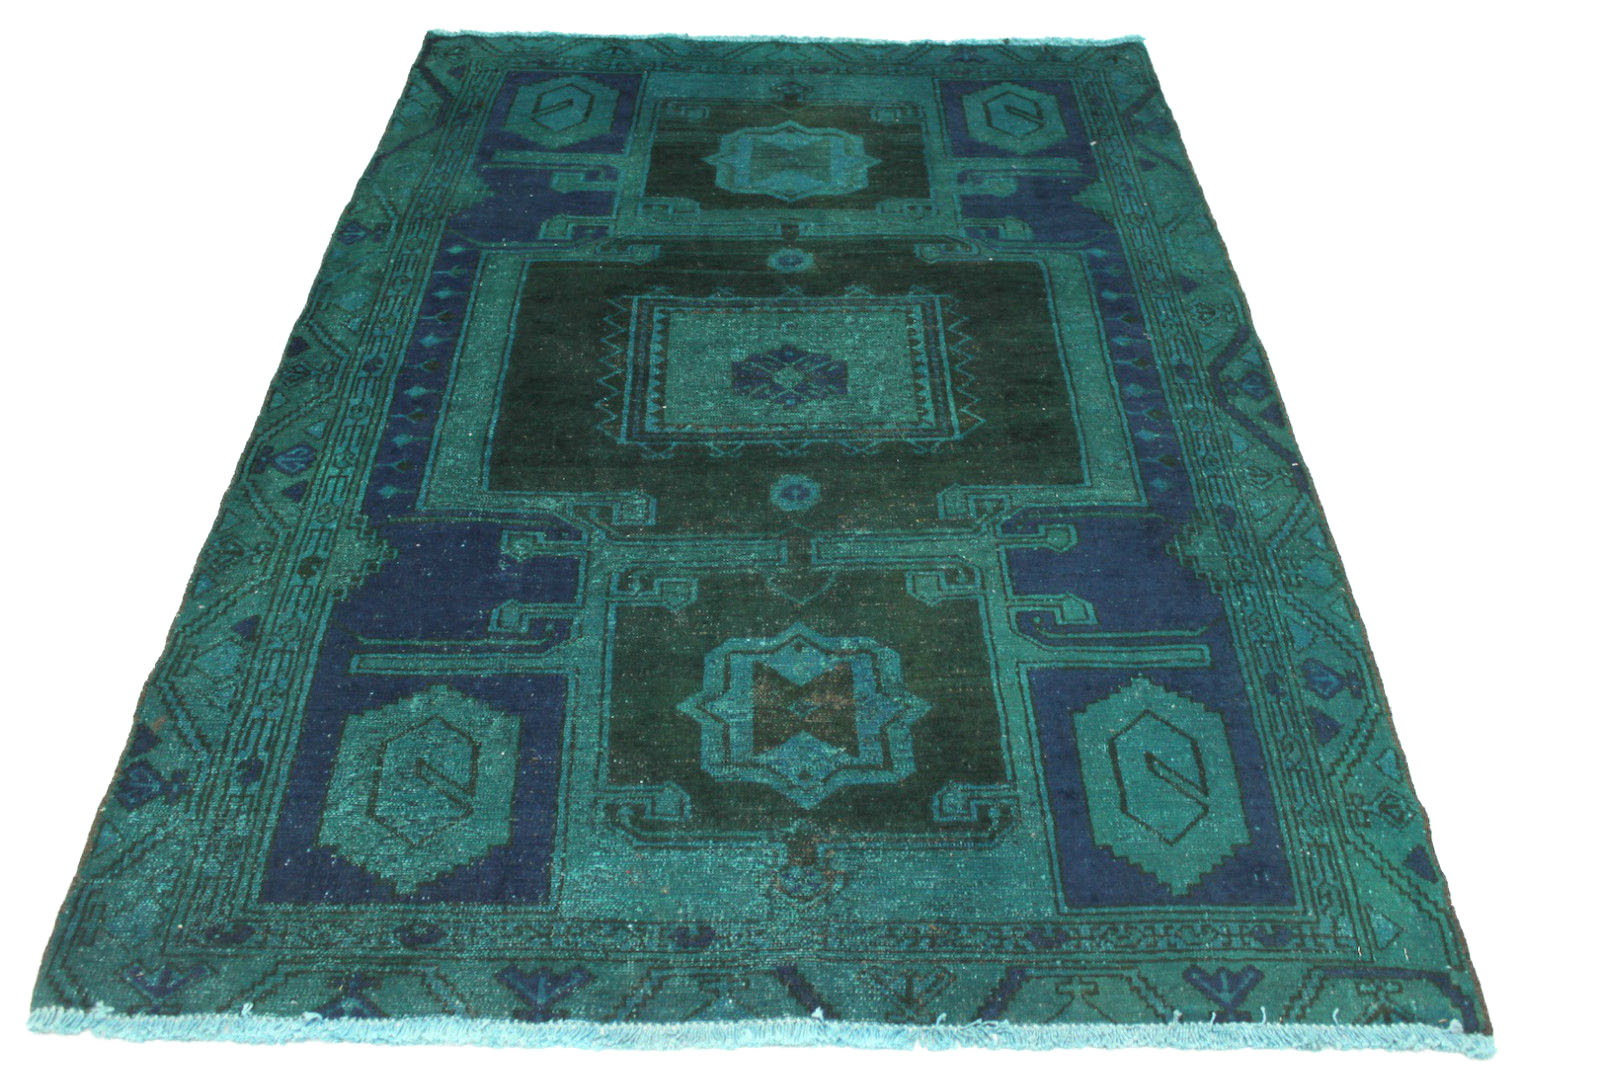 vintage teppich t rkis in 190x140cm 1001 3144 bei kaufen. Black Bedroom Furniture Sets. Home Design Ideas